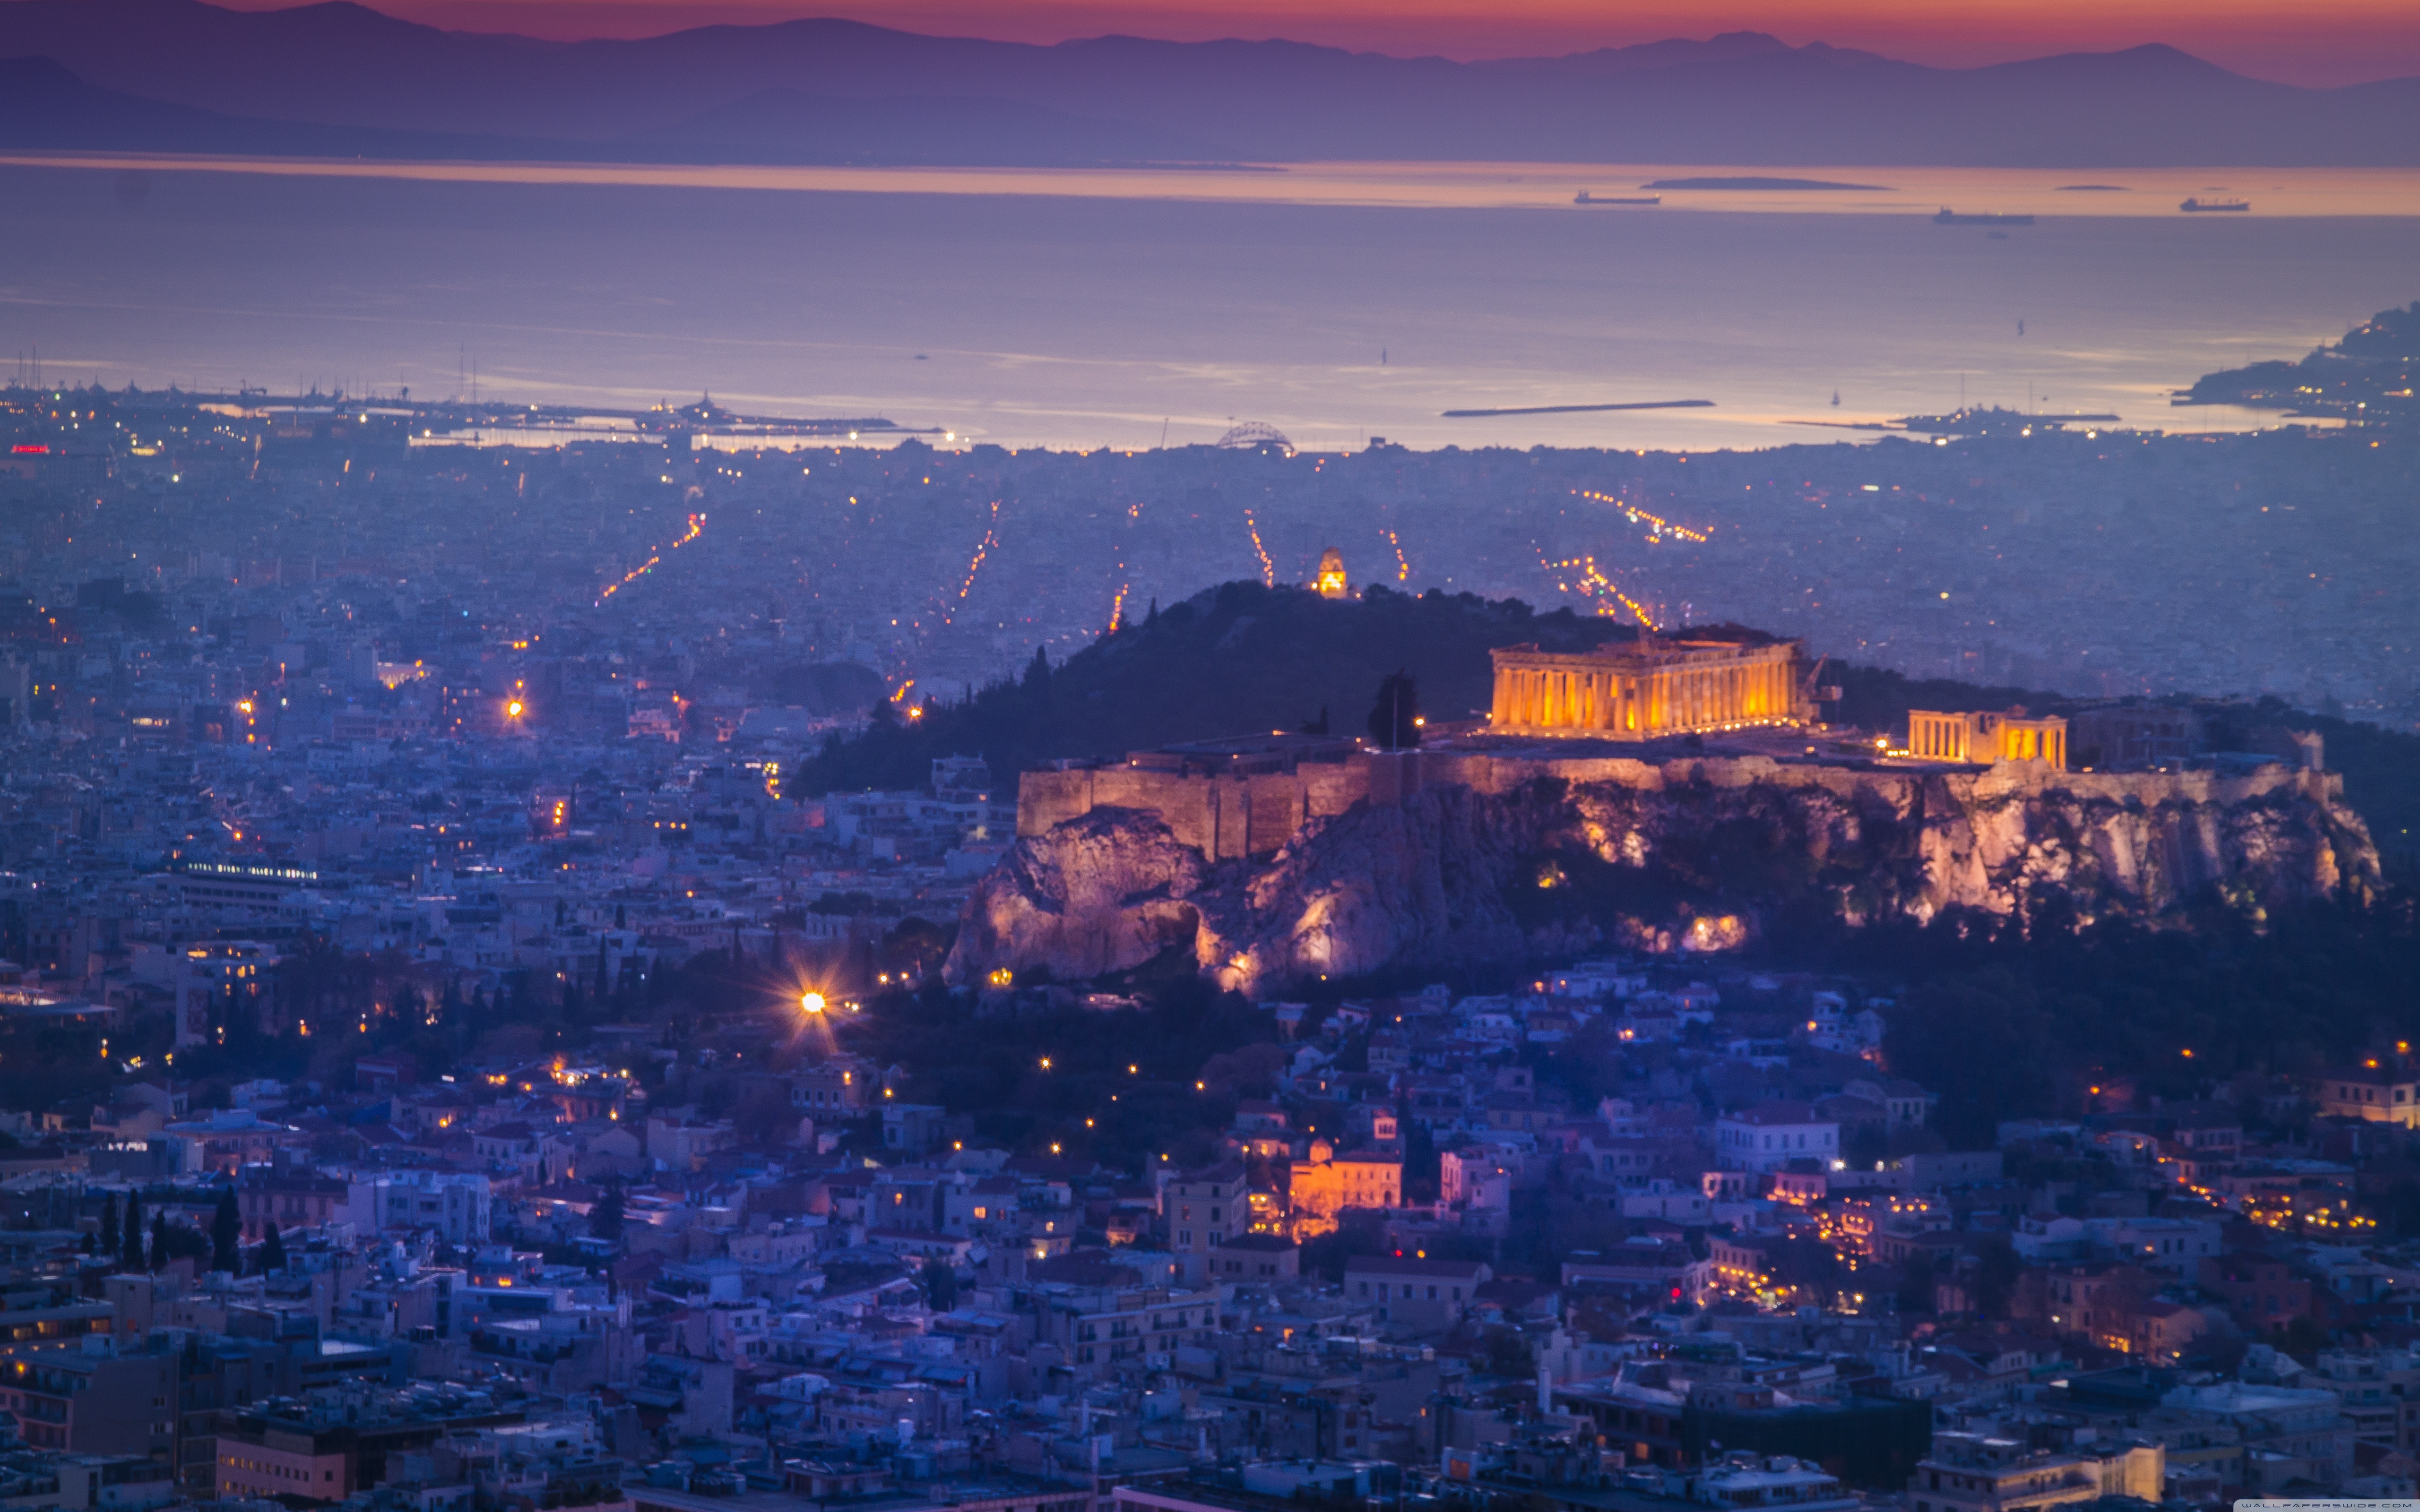 Athens by night 4K HD Desktop Wallpaper for 4K Ultra HD TV 5120x3200